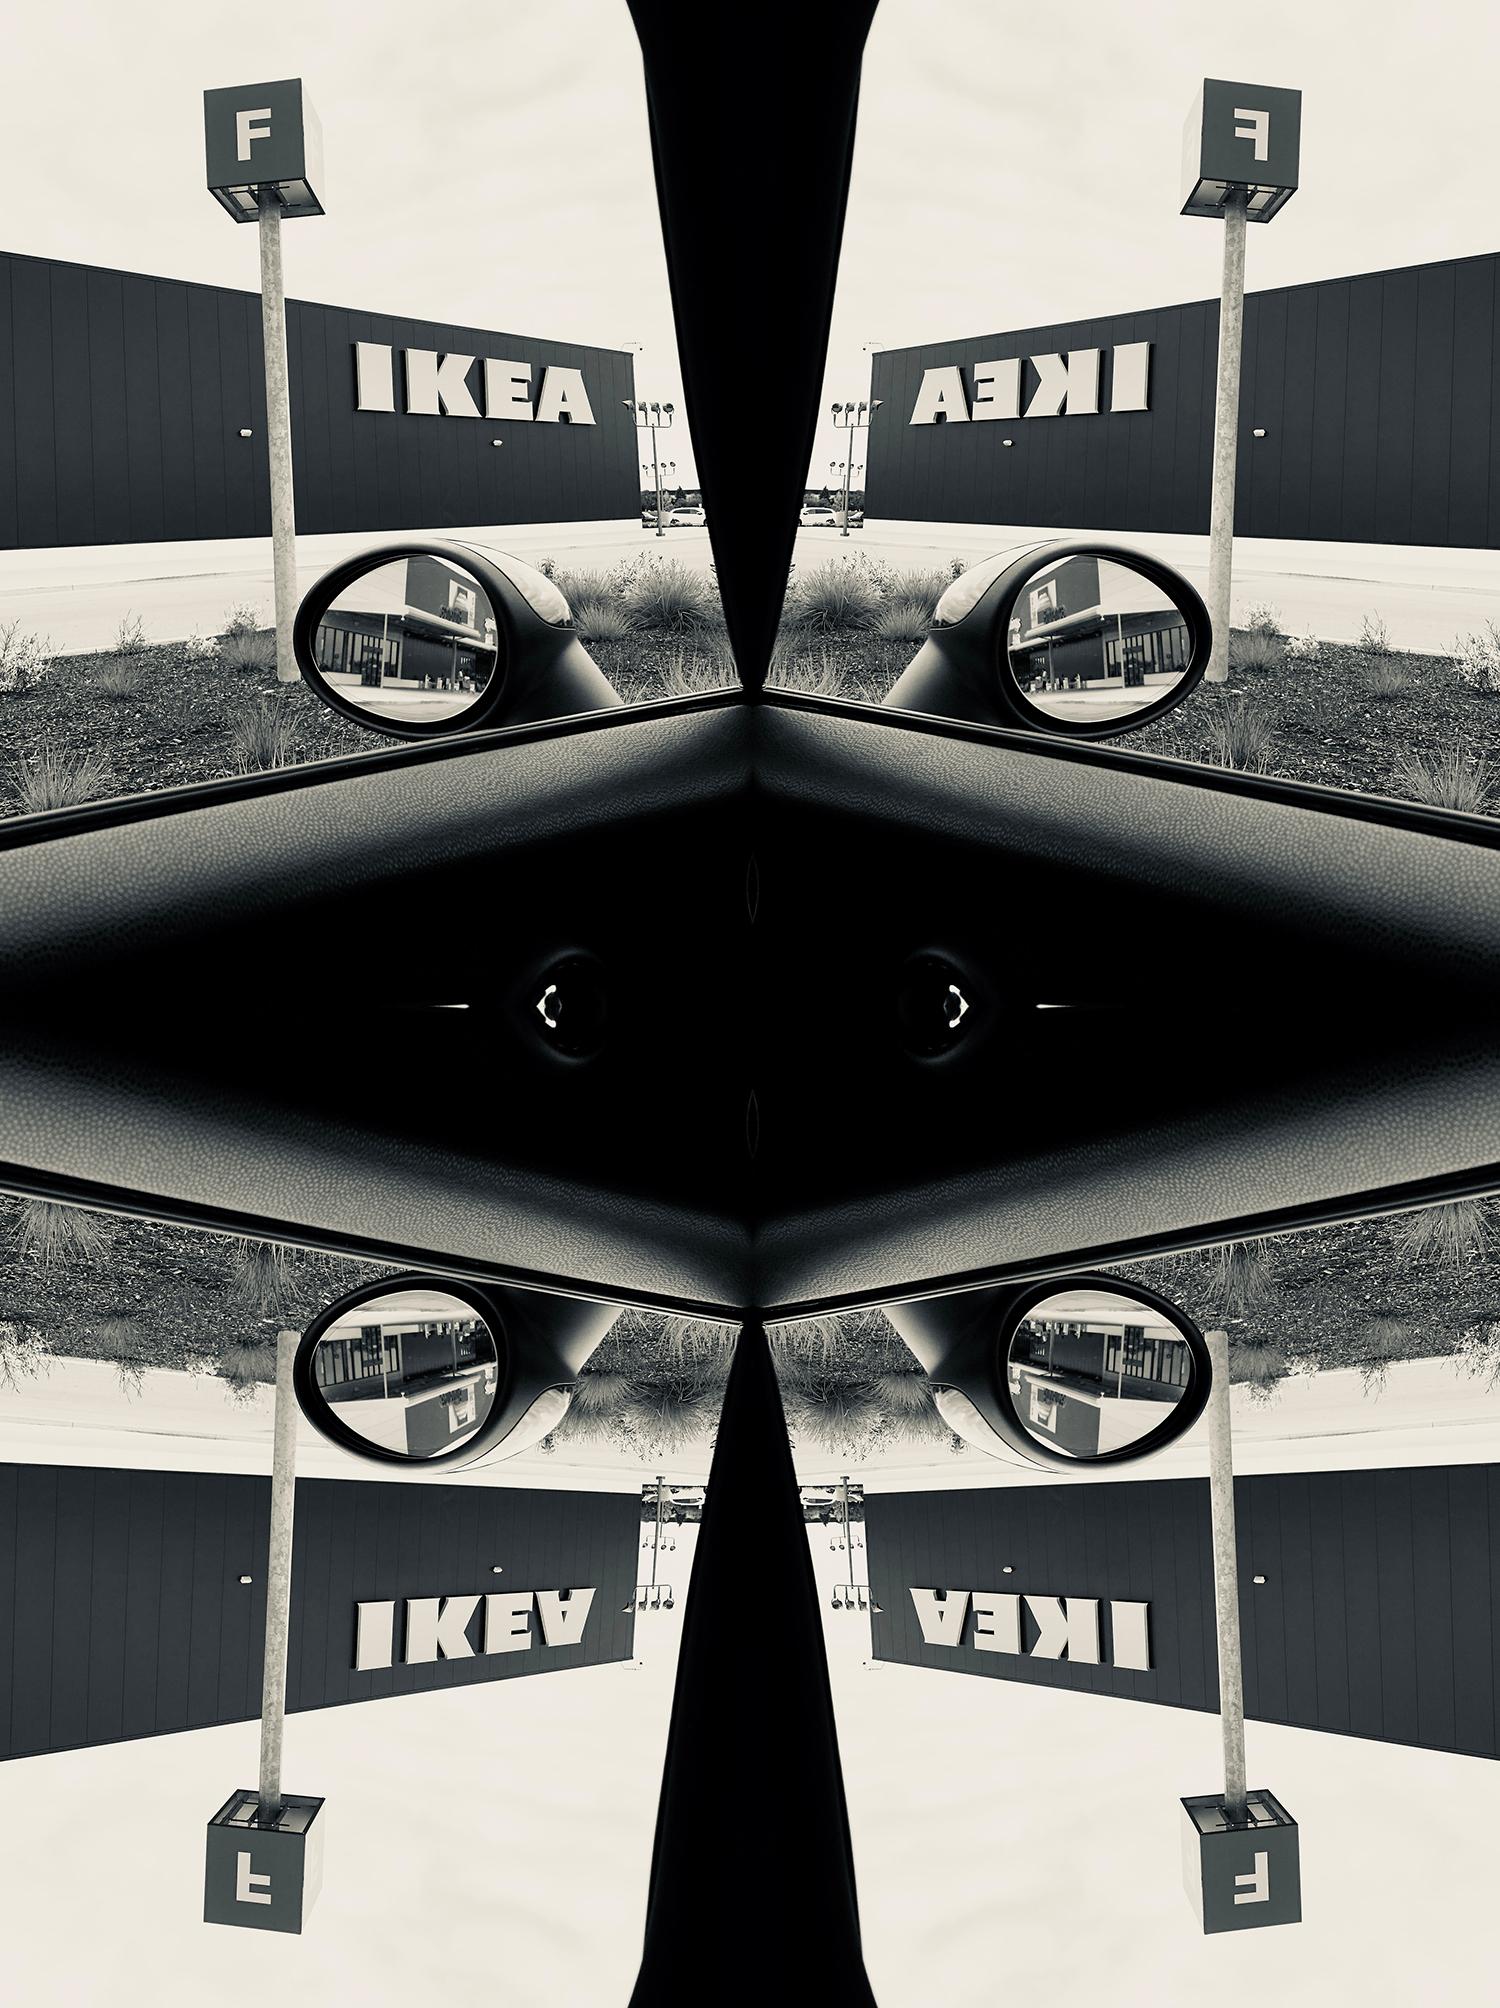 Ikea1.2.jpg